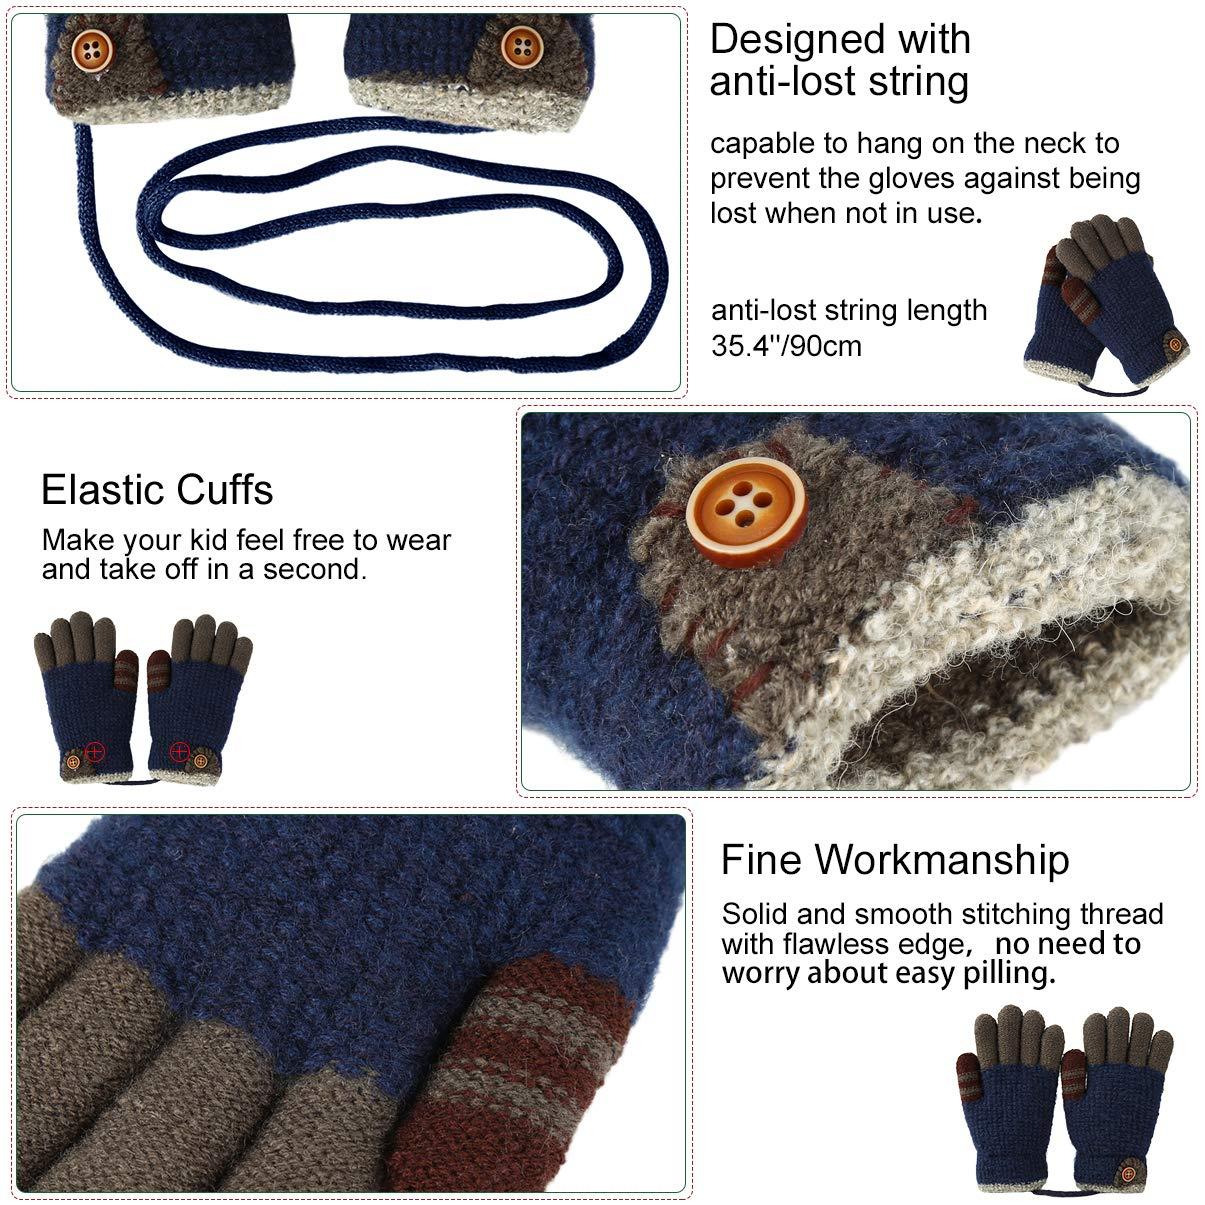 VBG VBIGER Kids Winter Gloves Girls Boys Warm Knitted Gloves Fleece Lined Full Finger Gloves for Children 4-8 Years Old (One Size, Color 1)